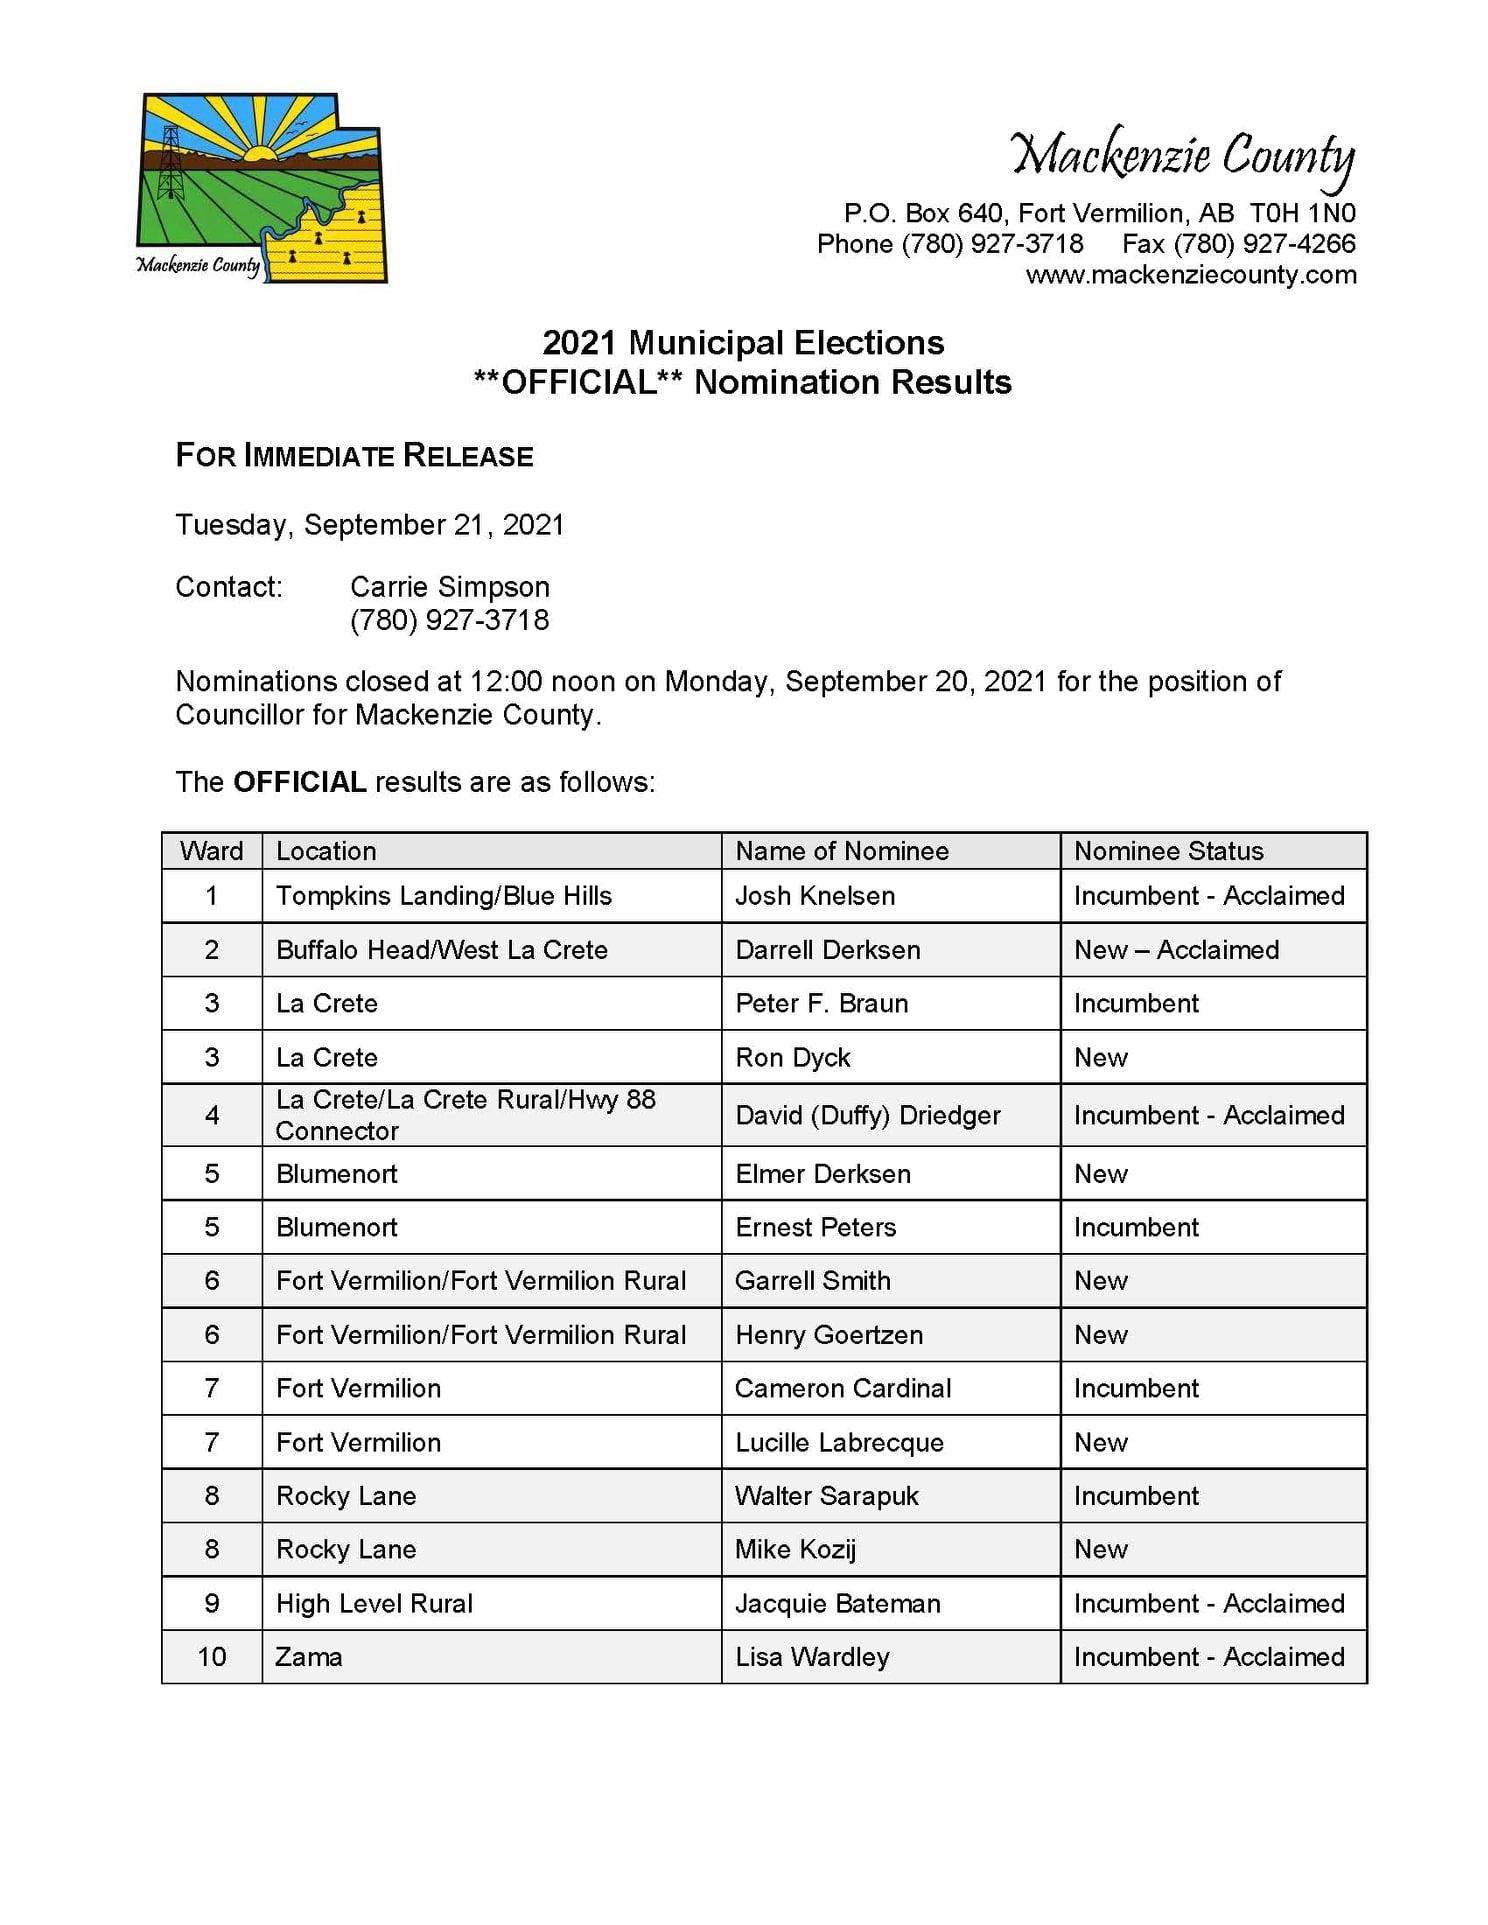 Mackenzie County Nomination Results 2021